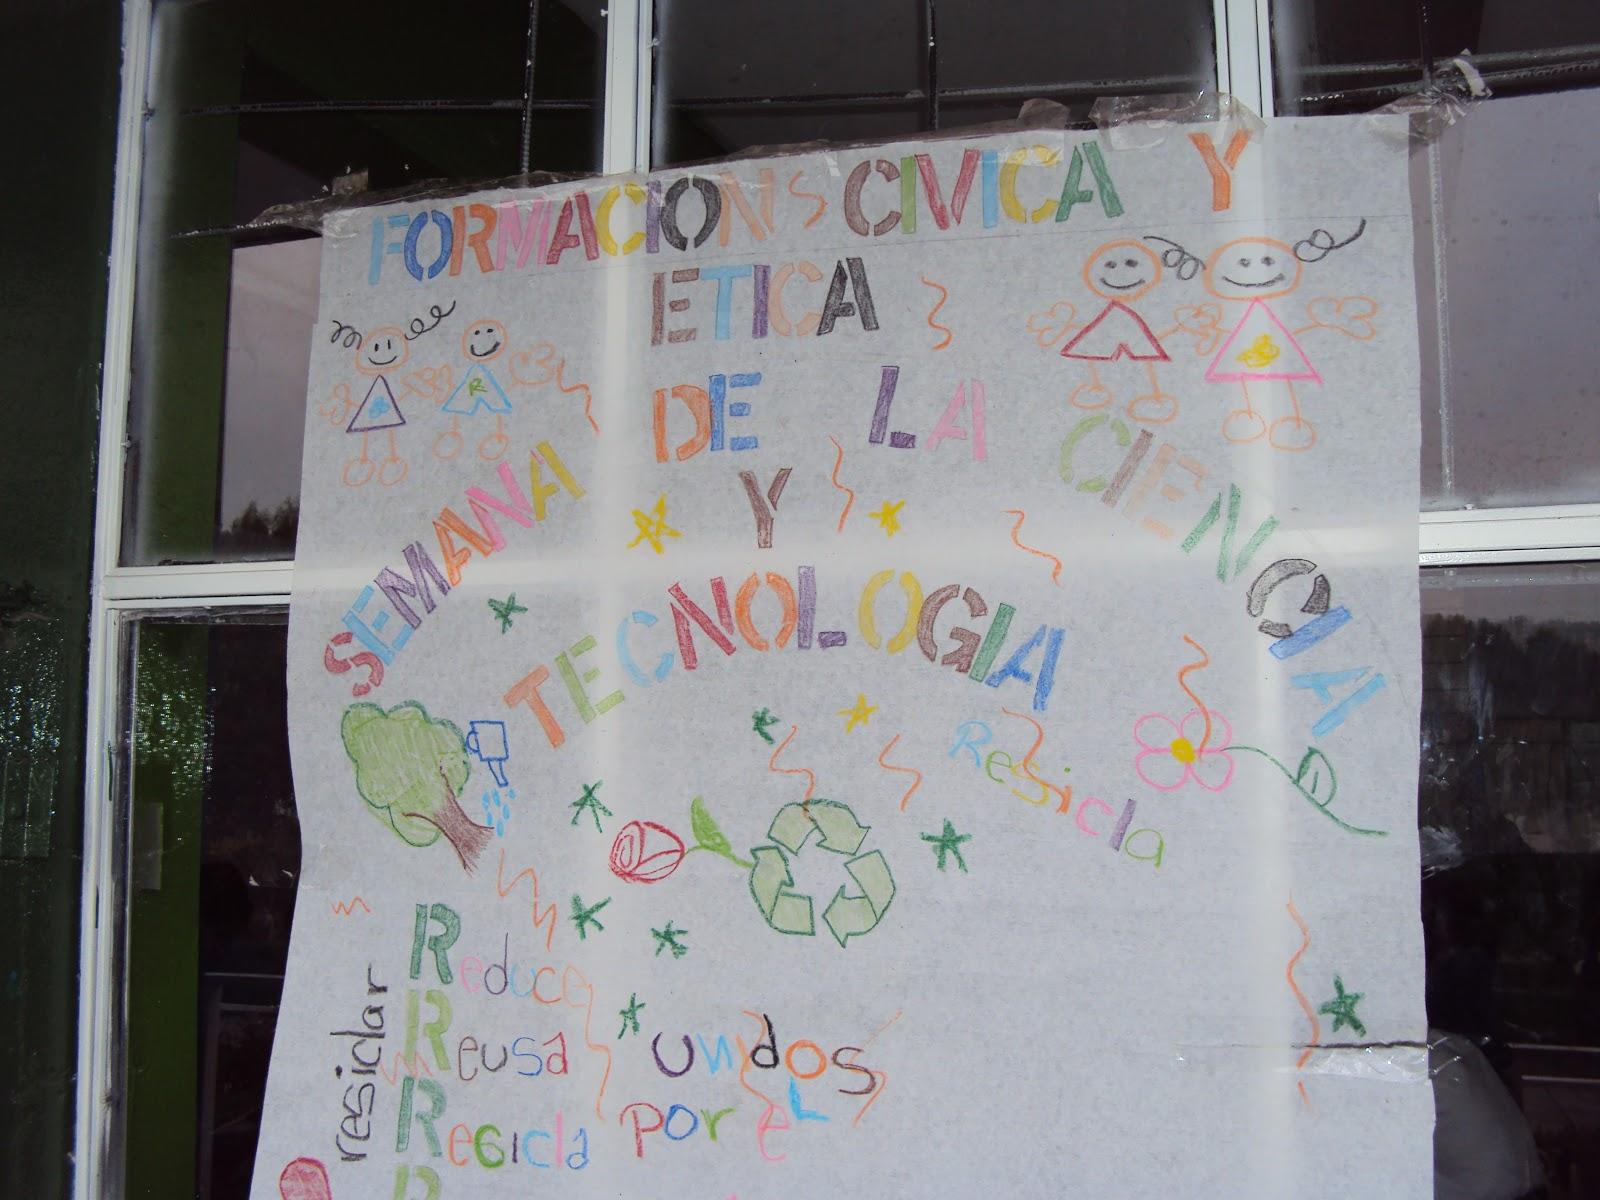 Comit de valores rosario castellanos semana de for Articulo de cultura para periodico mural